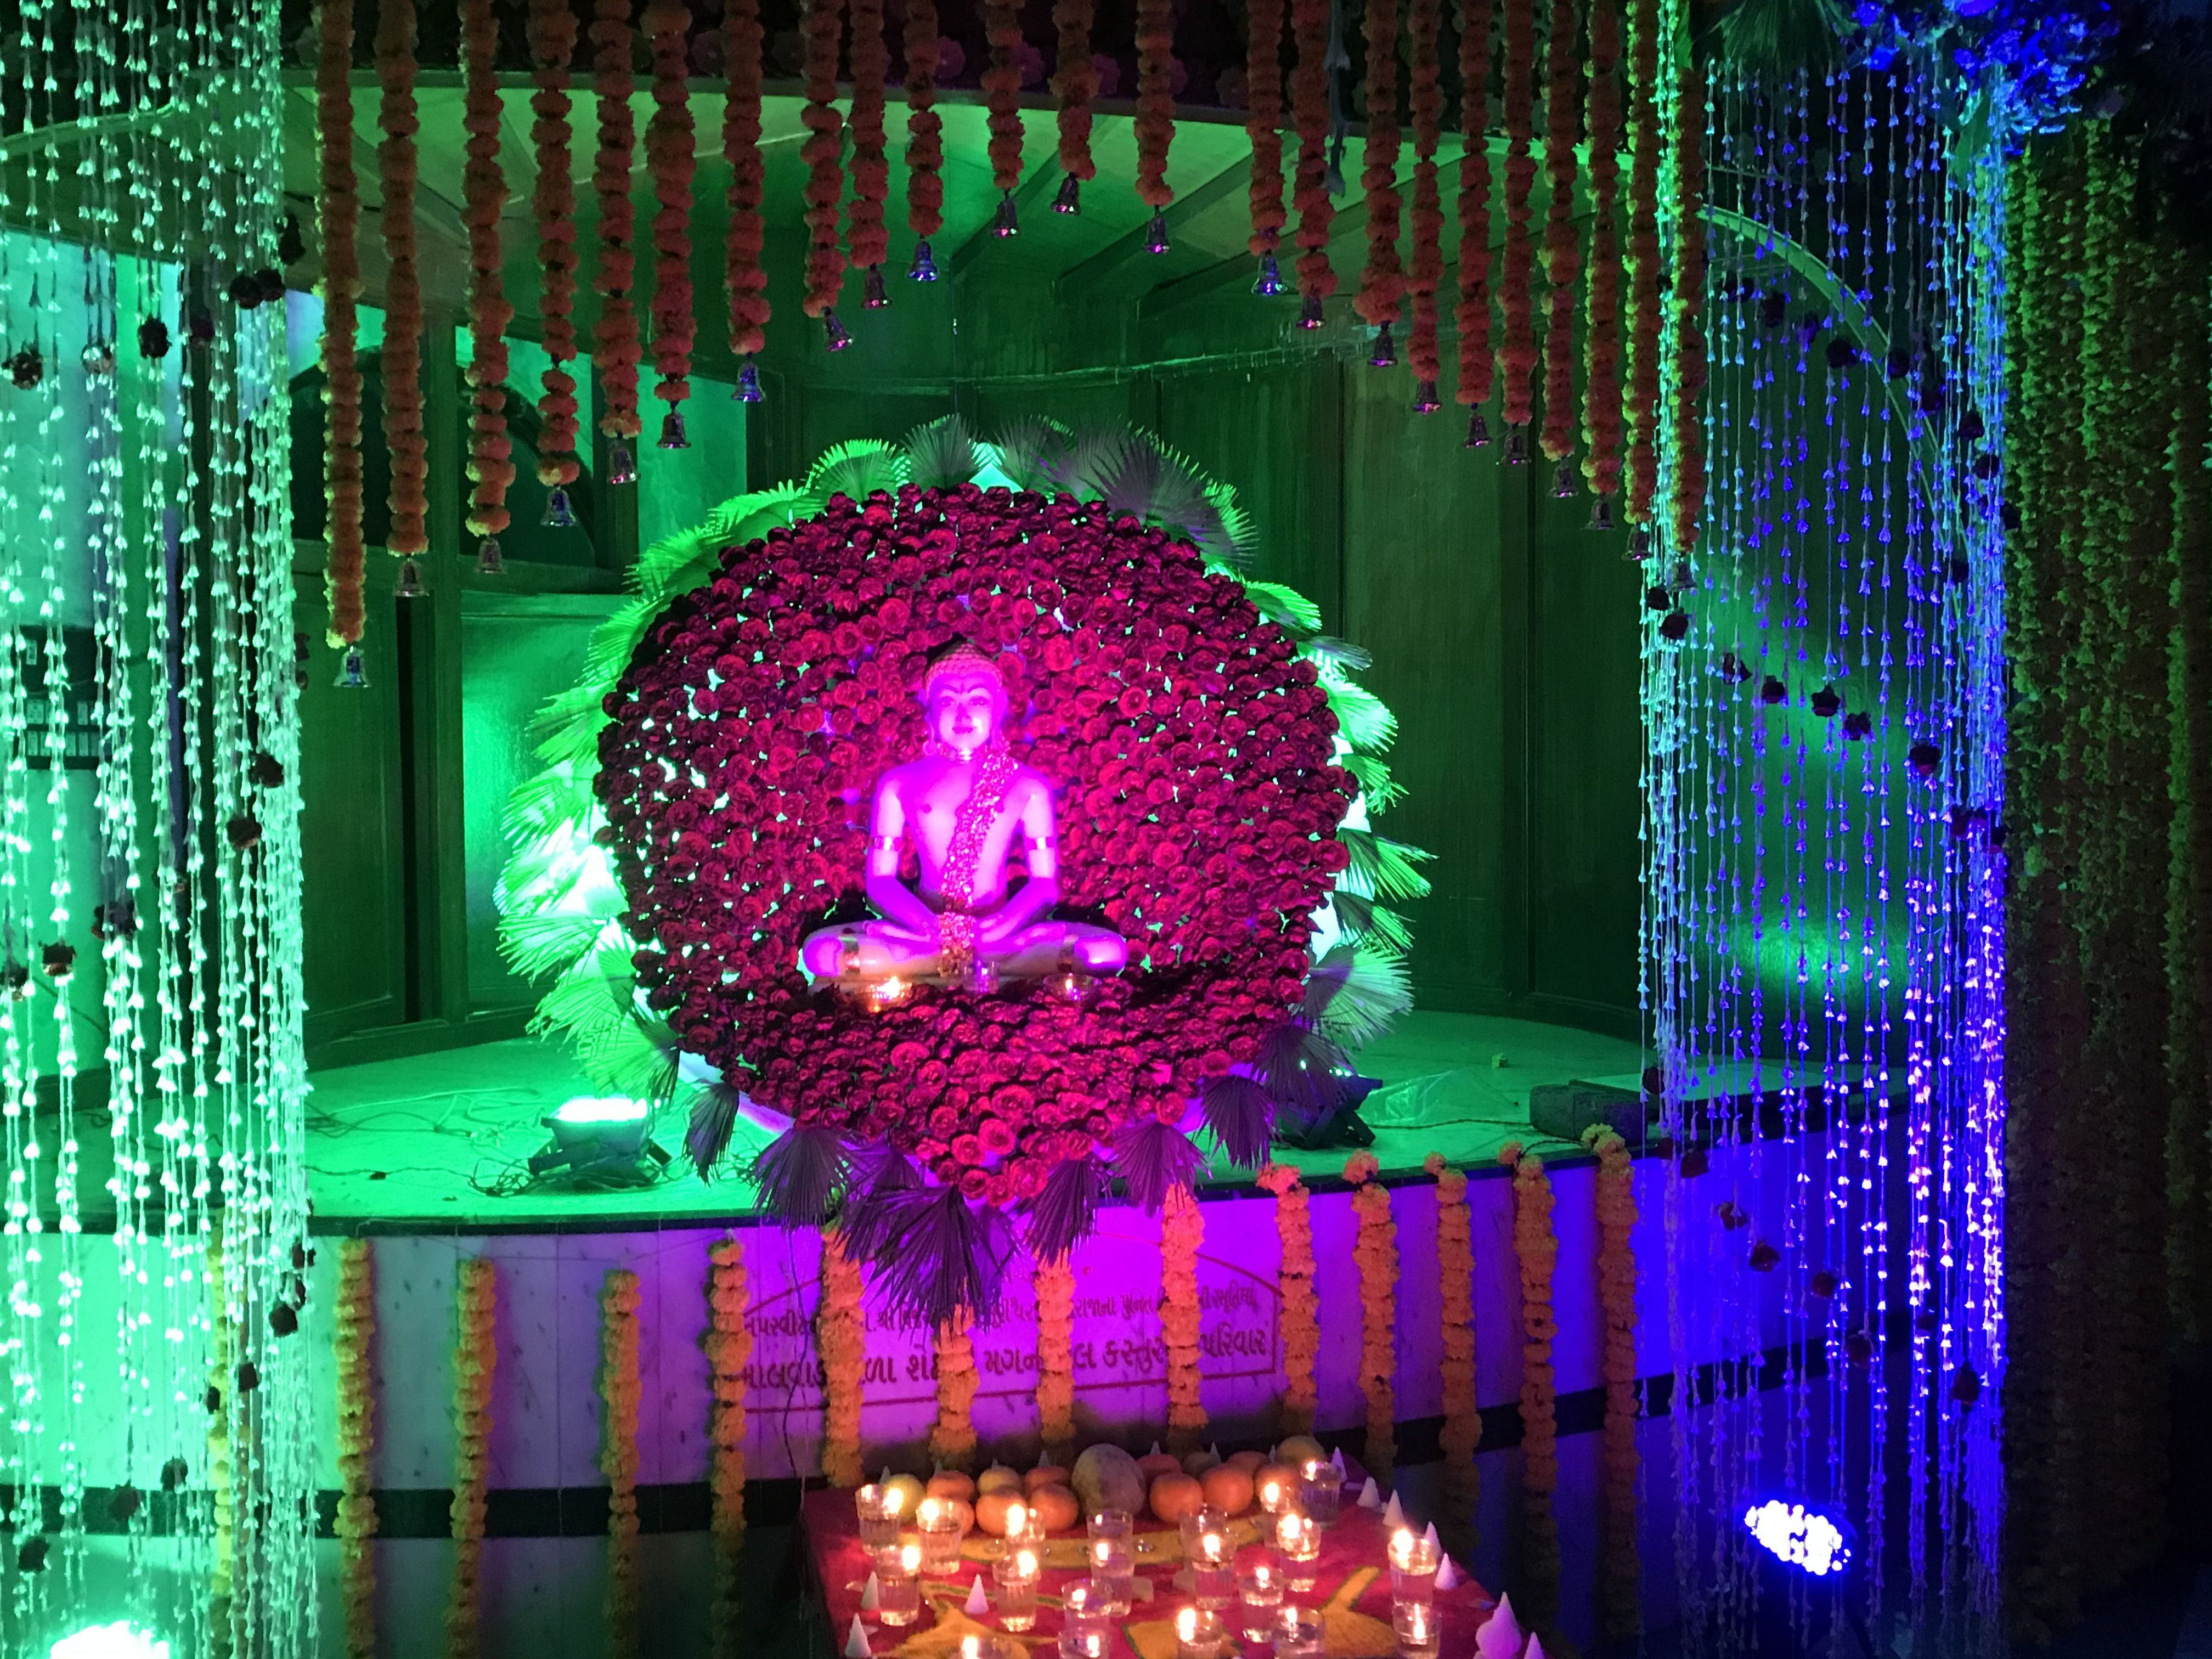 Pin by Tushar Shah on Pujaya YASHOVIJAY GURU MAA (2020) Guru